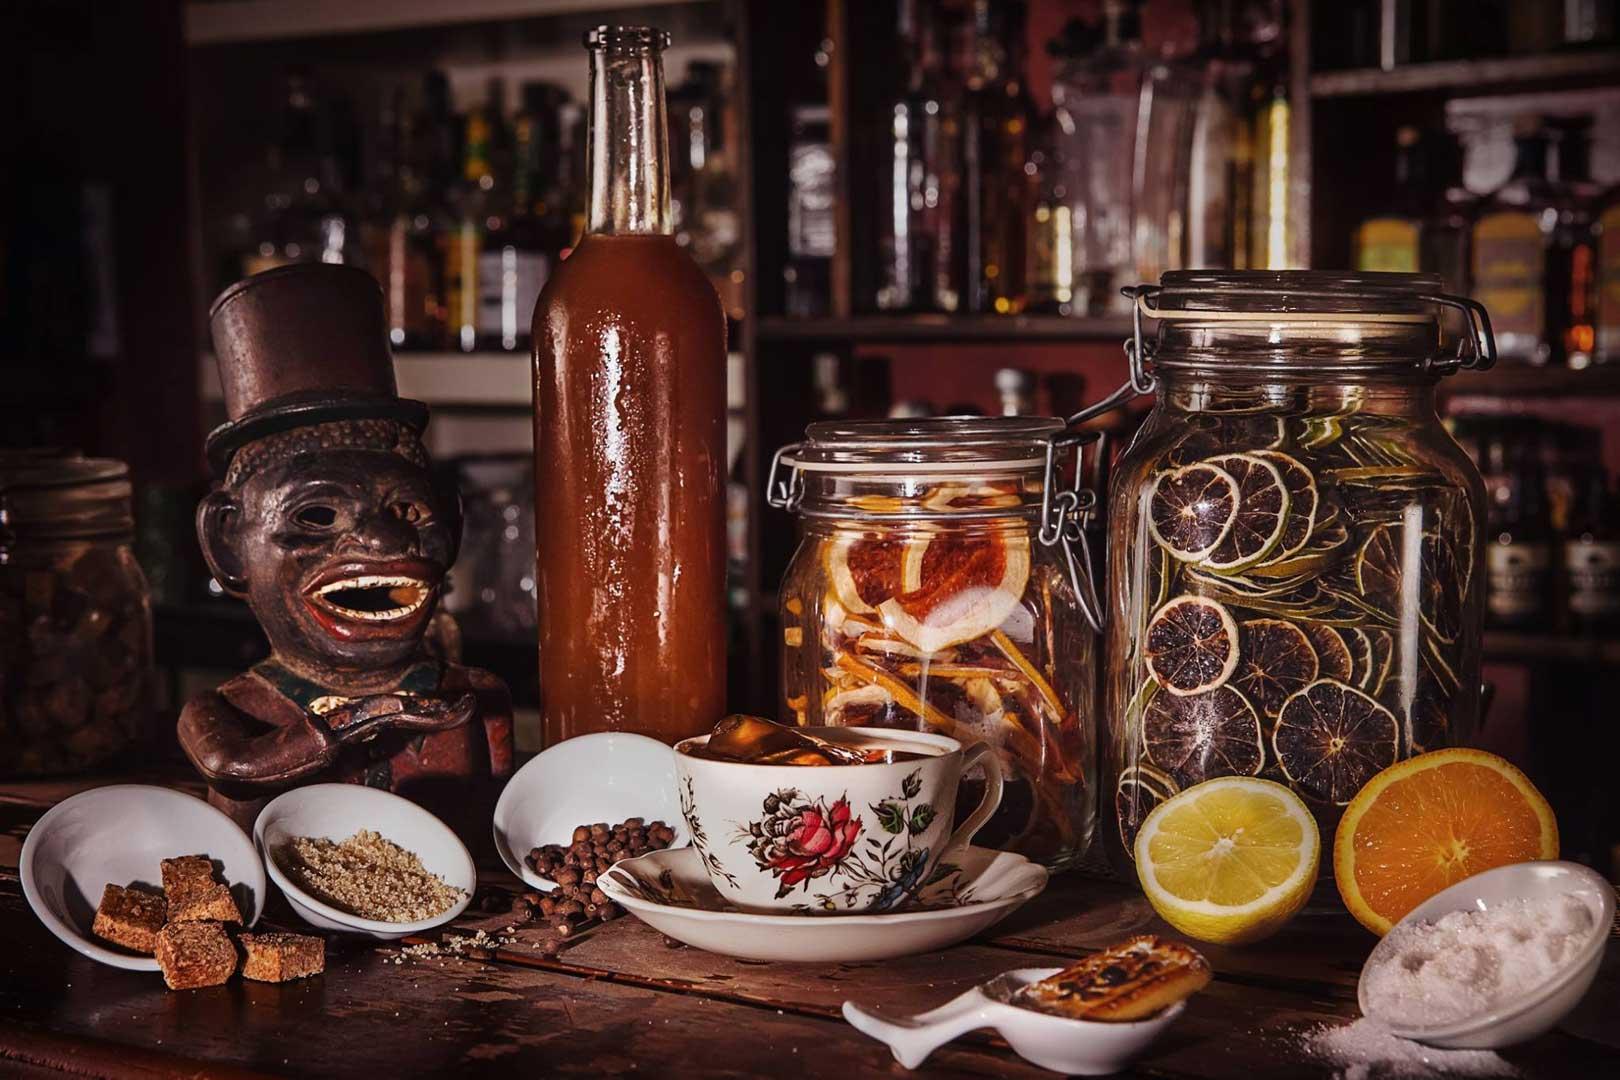 I 10 migliori cocktail bar d'Italia - Jerry Thomas